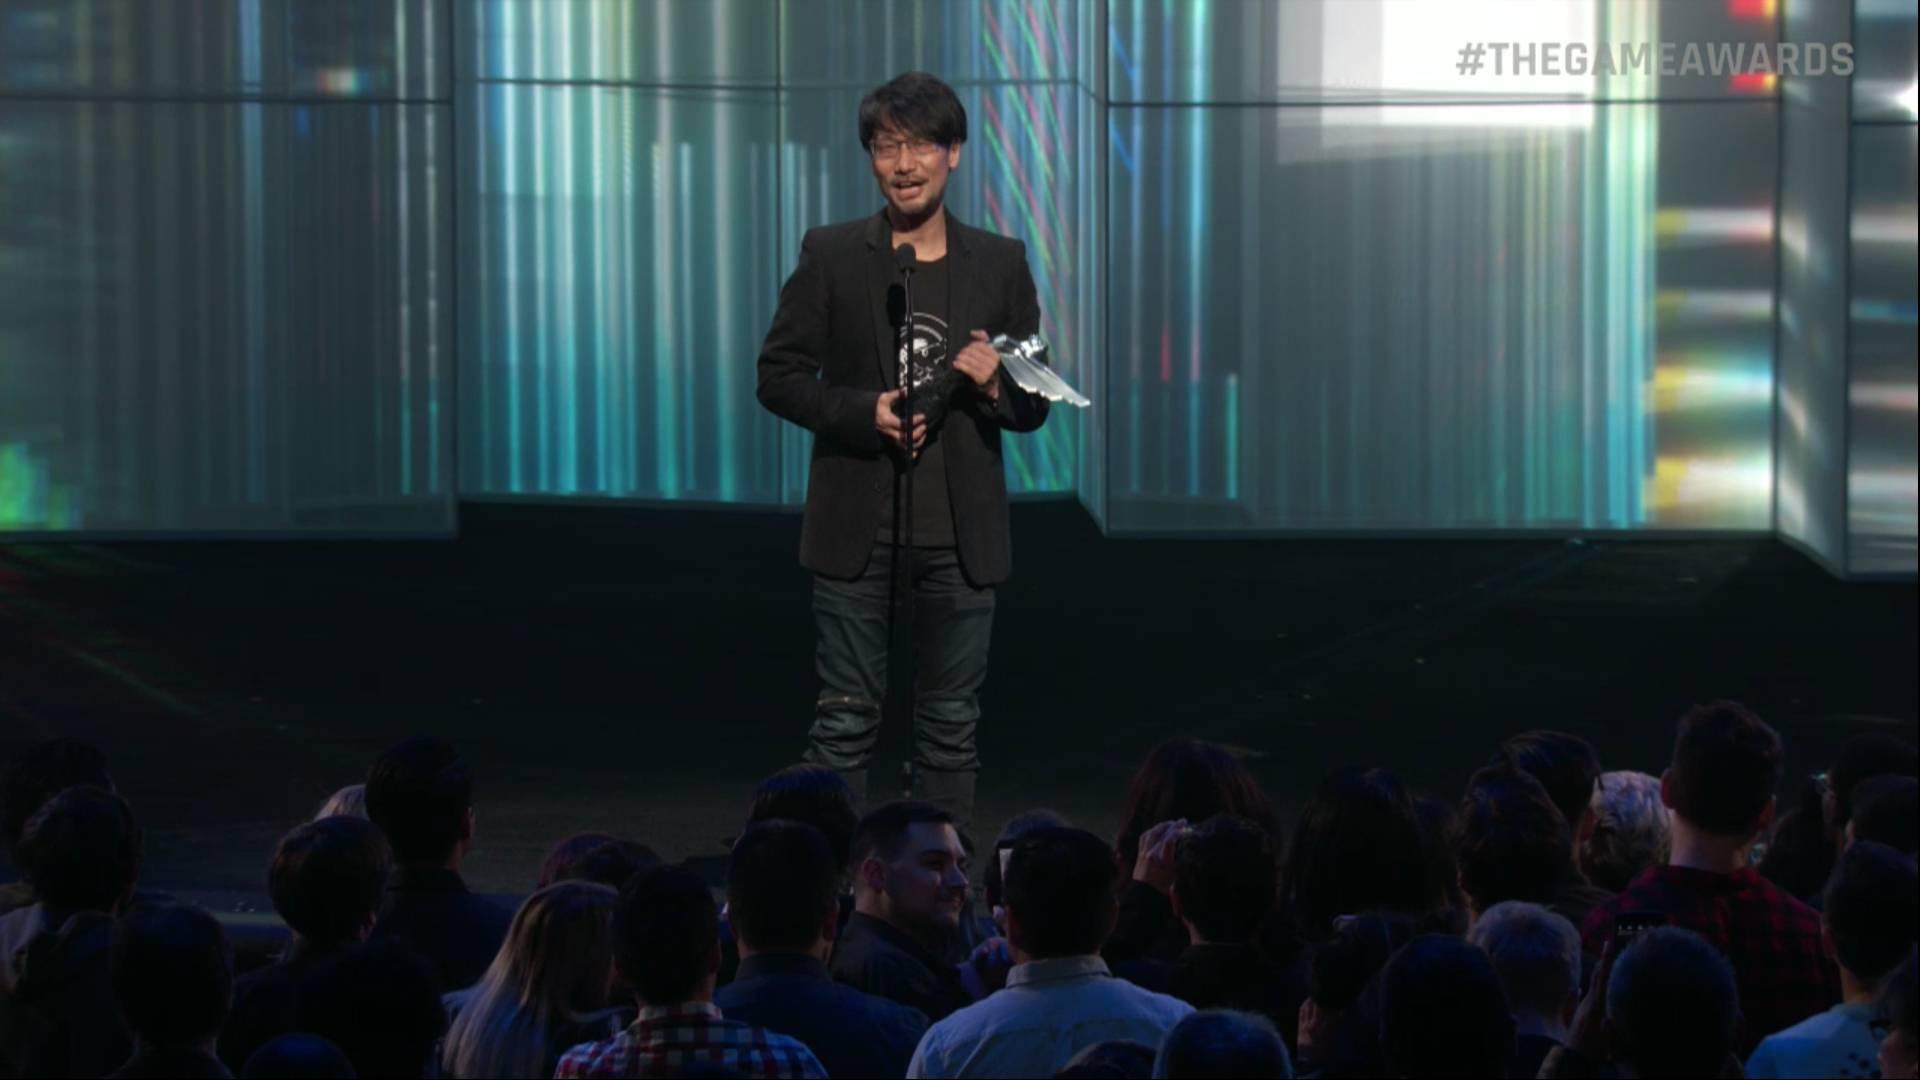 game awards-culturageek.com.ar